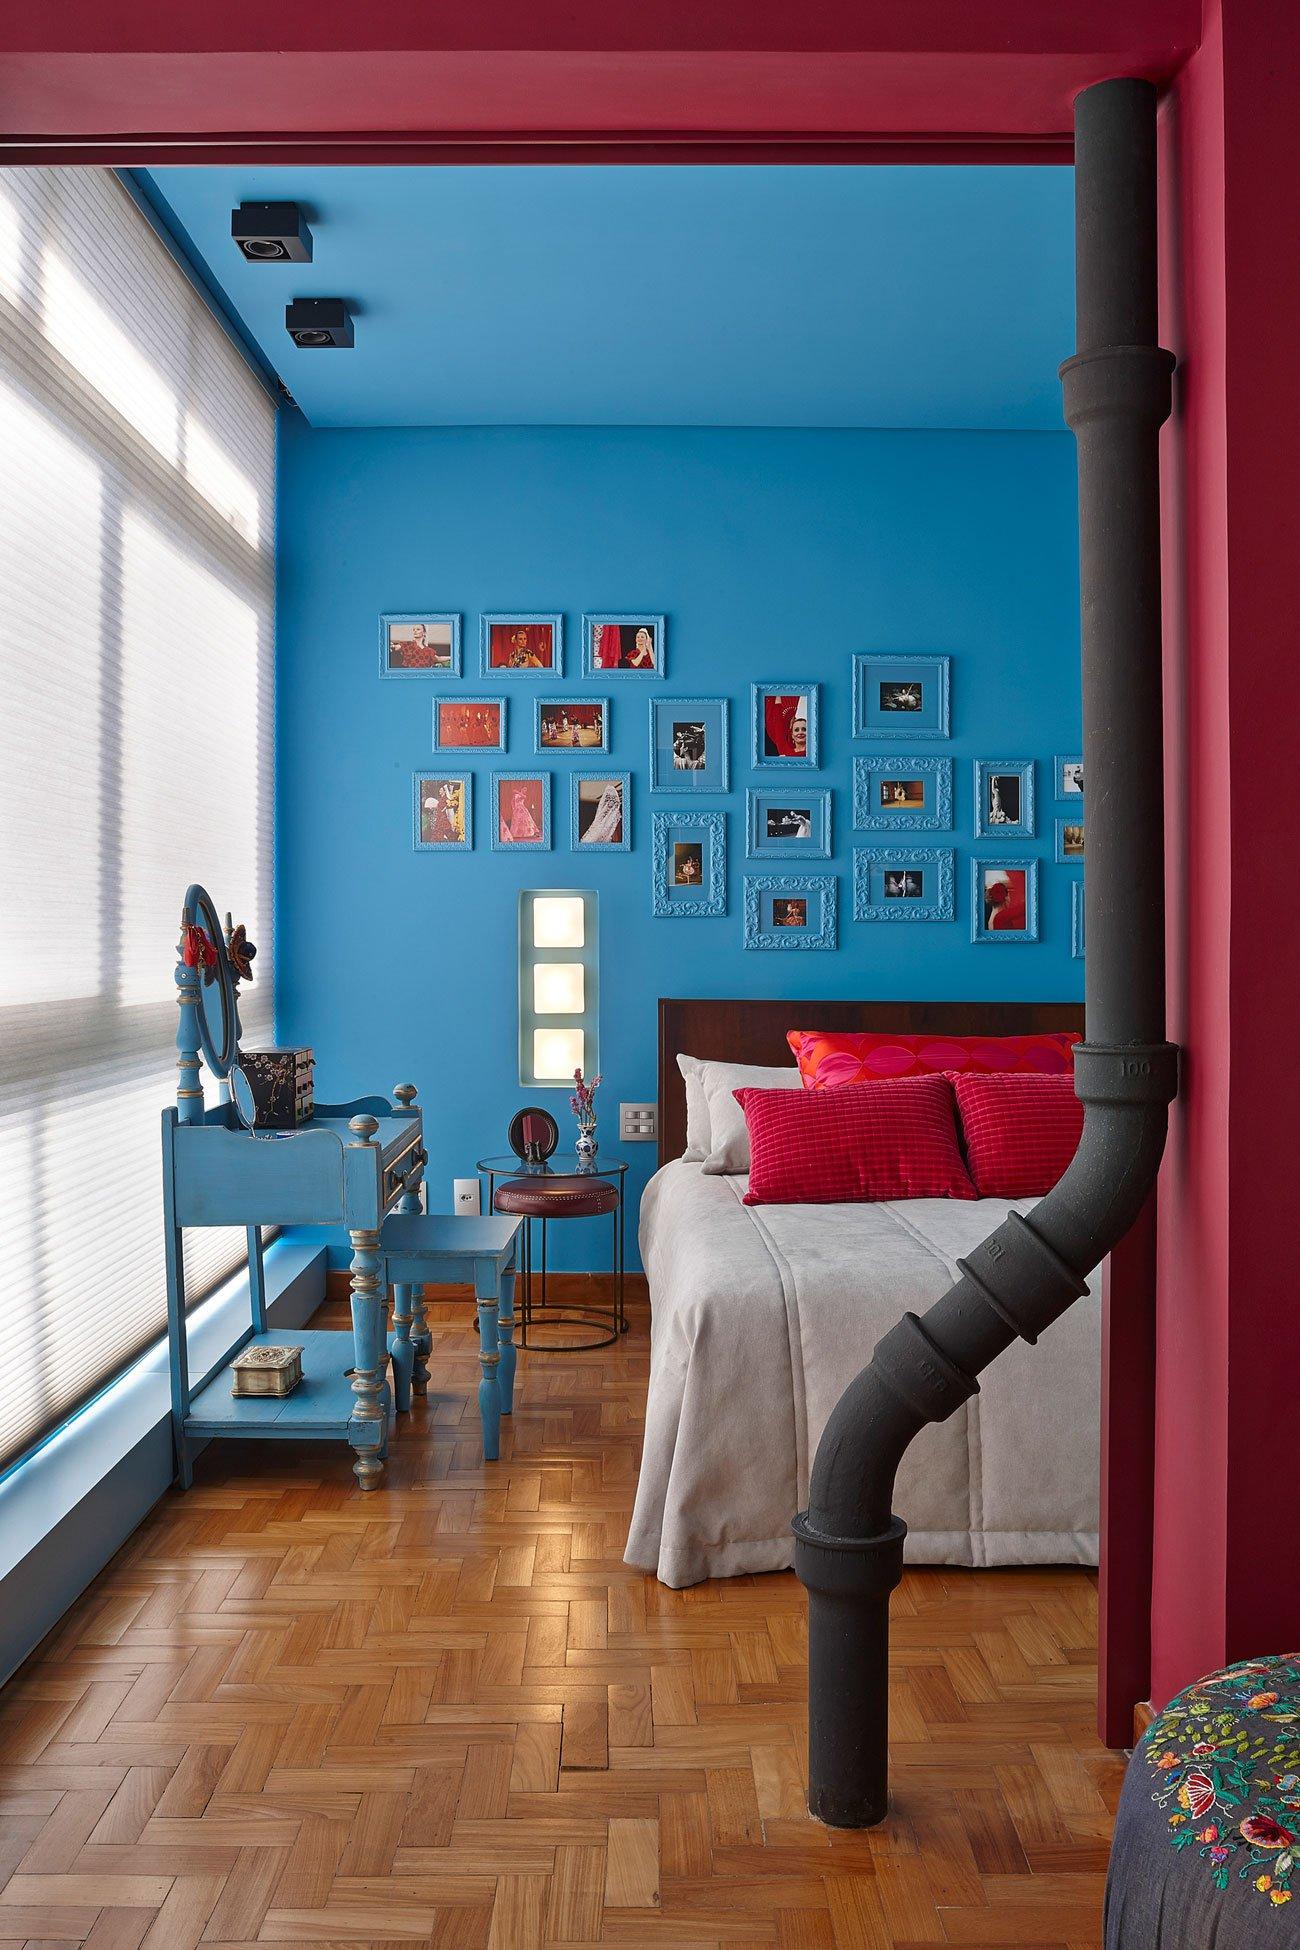 Apartment-in-Belo-Horizonte-17